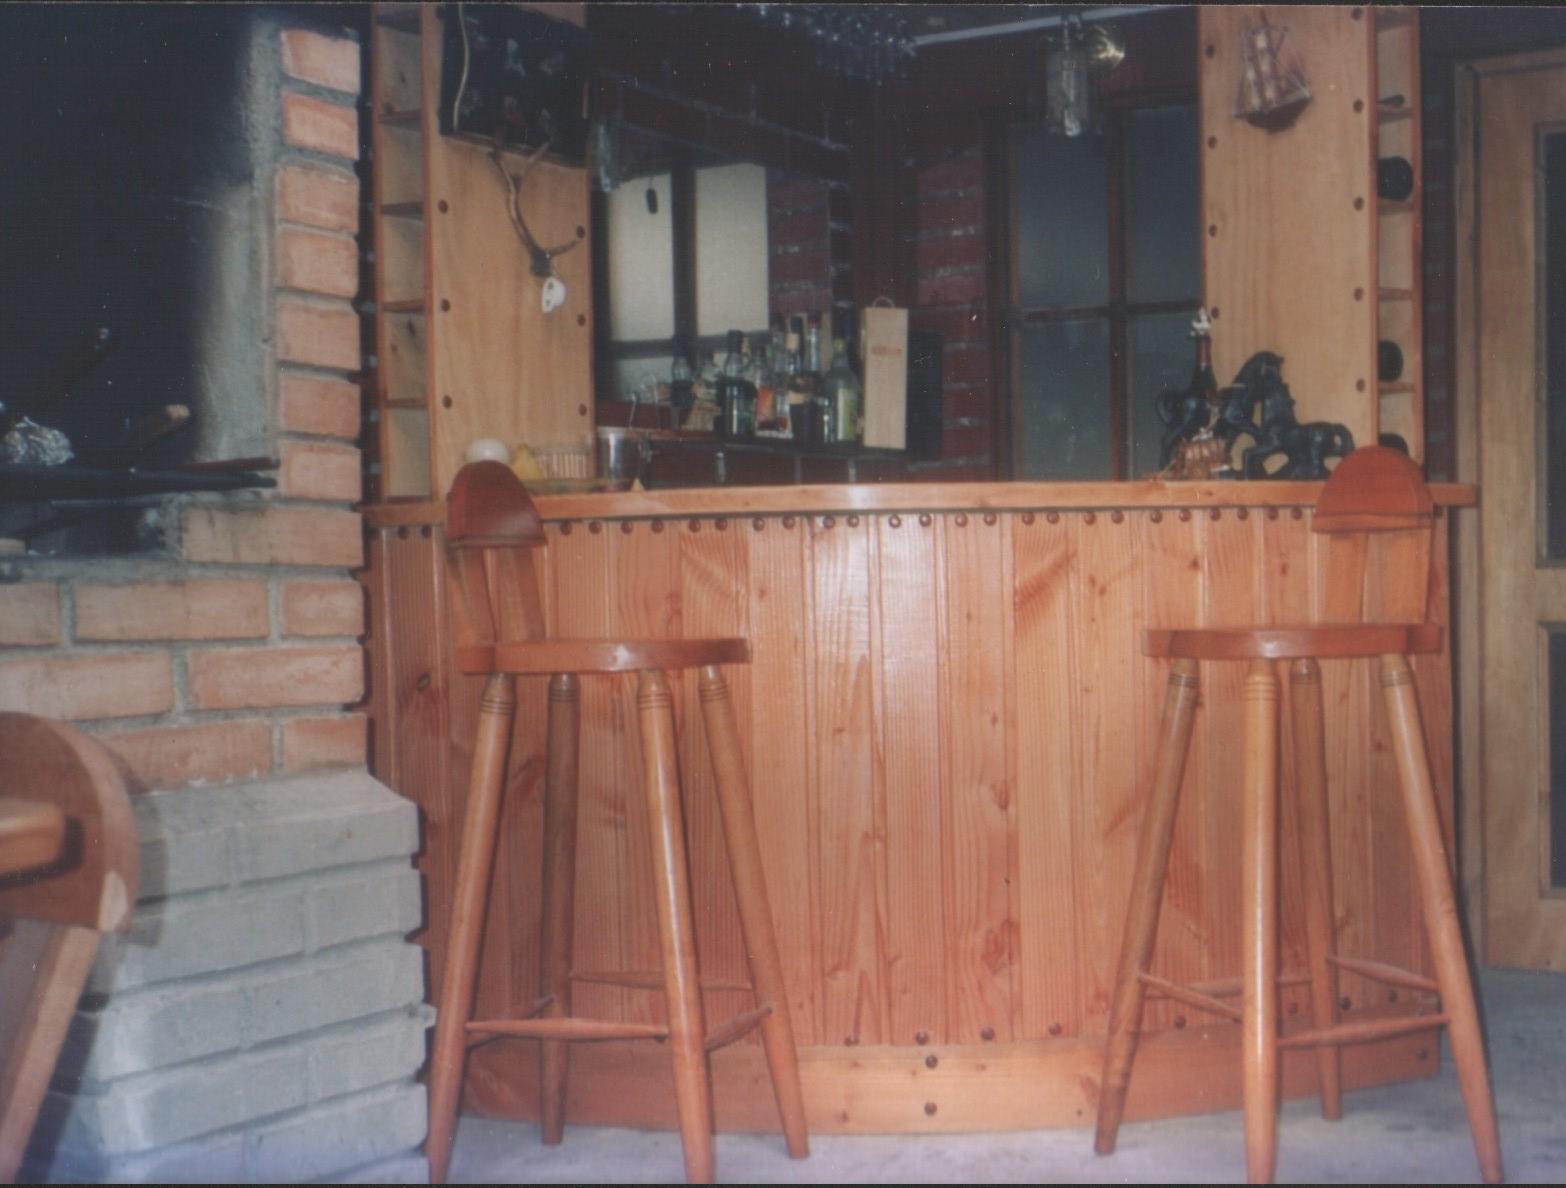 Bar de pino oreg n fabricaci n de muebles puertas y for Bar de madera de pino